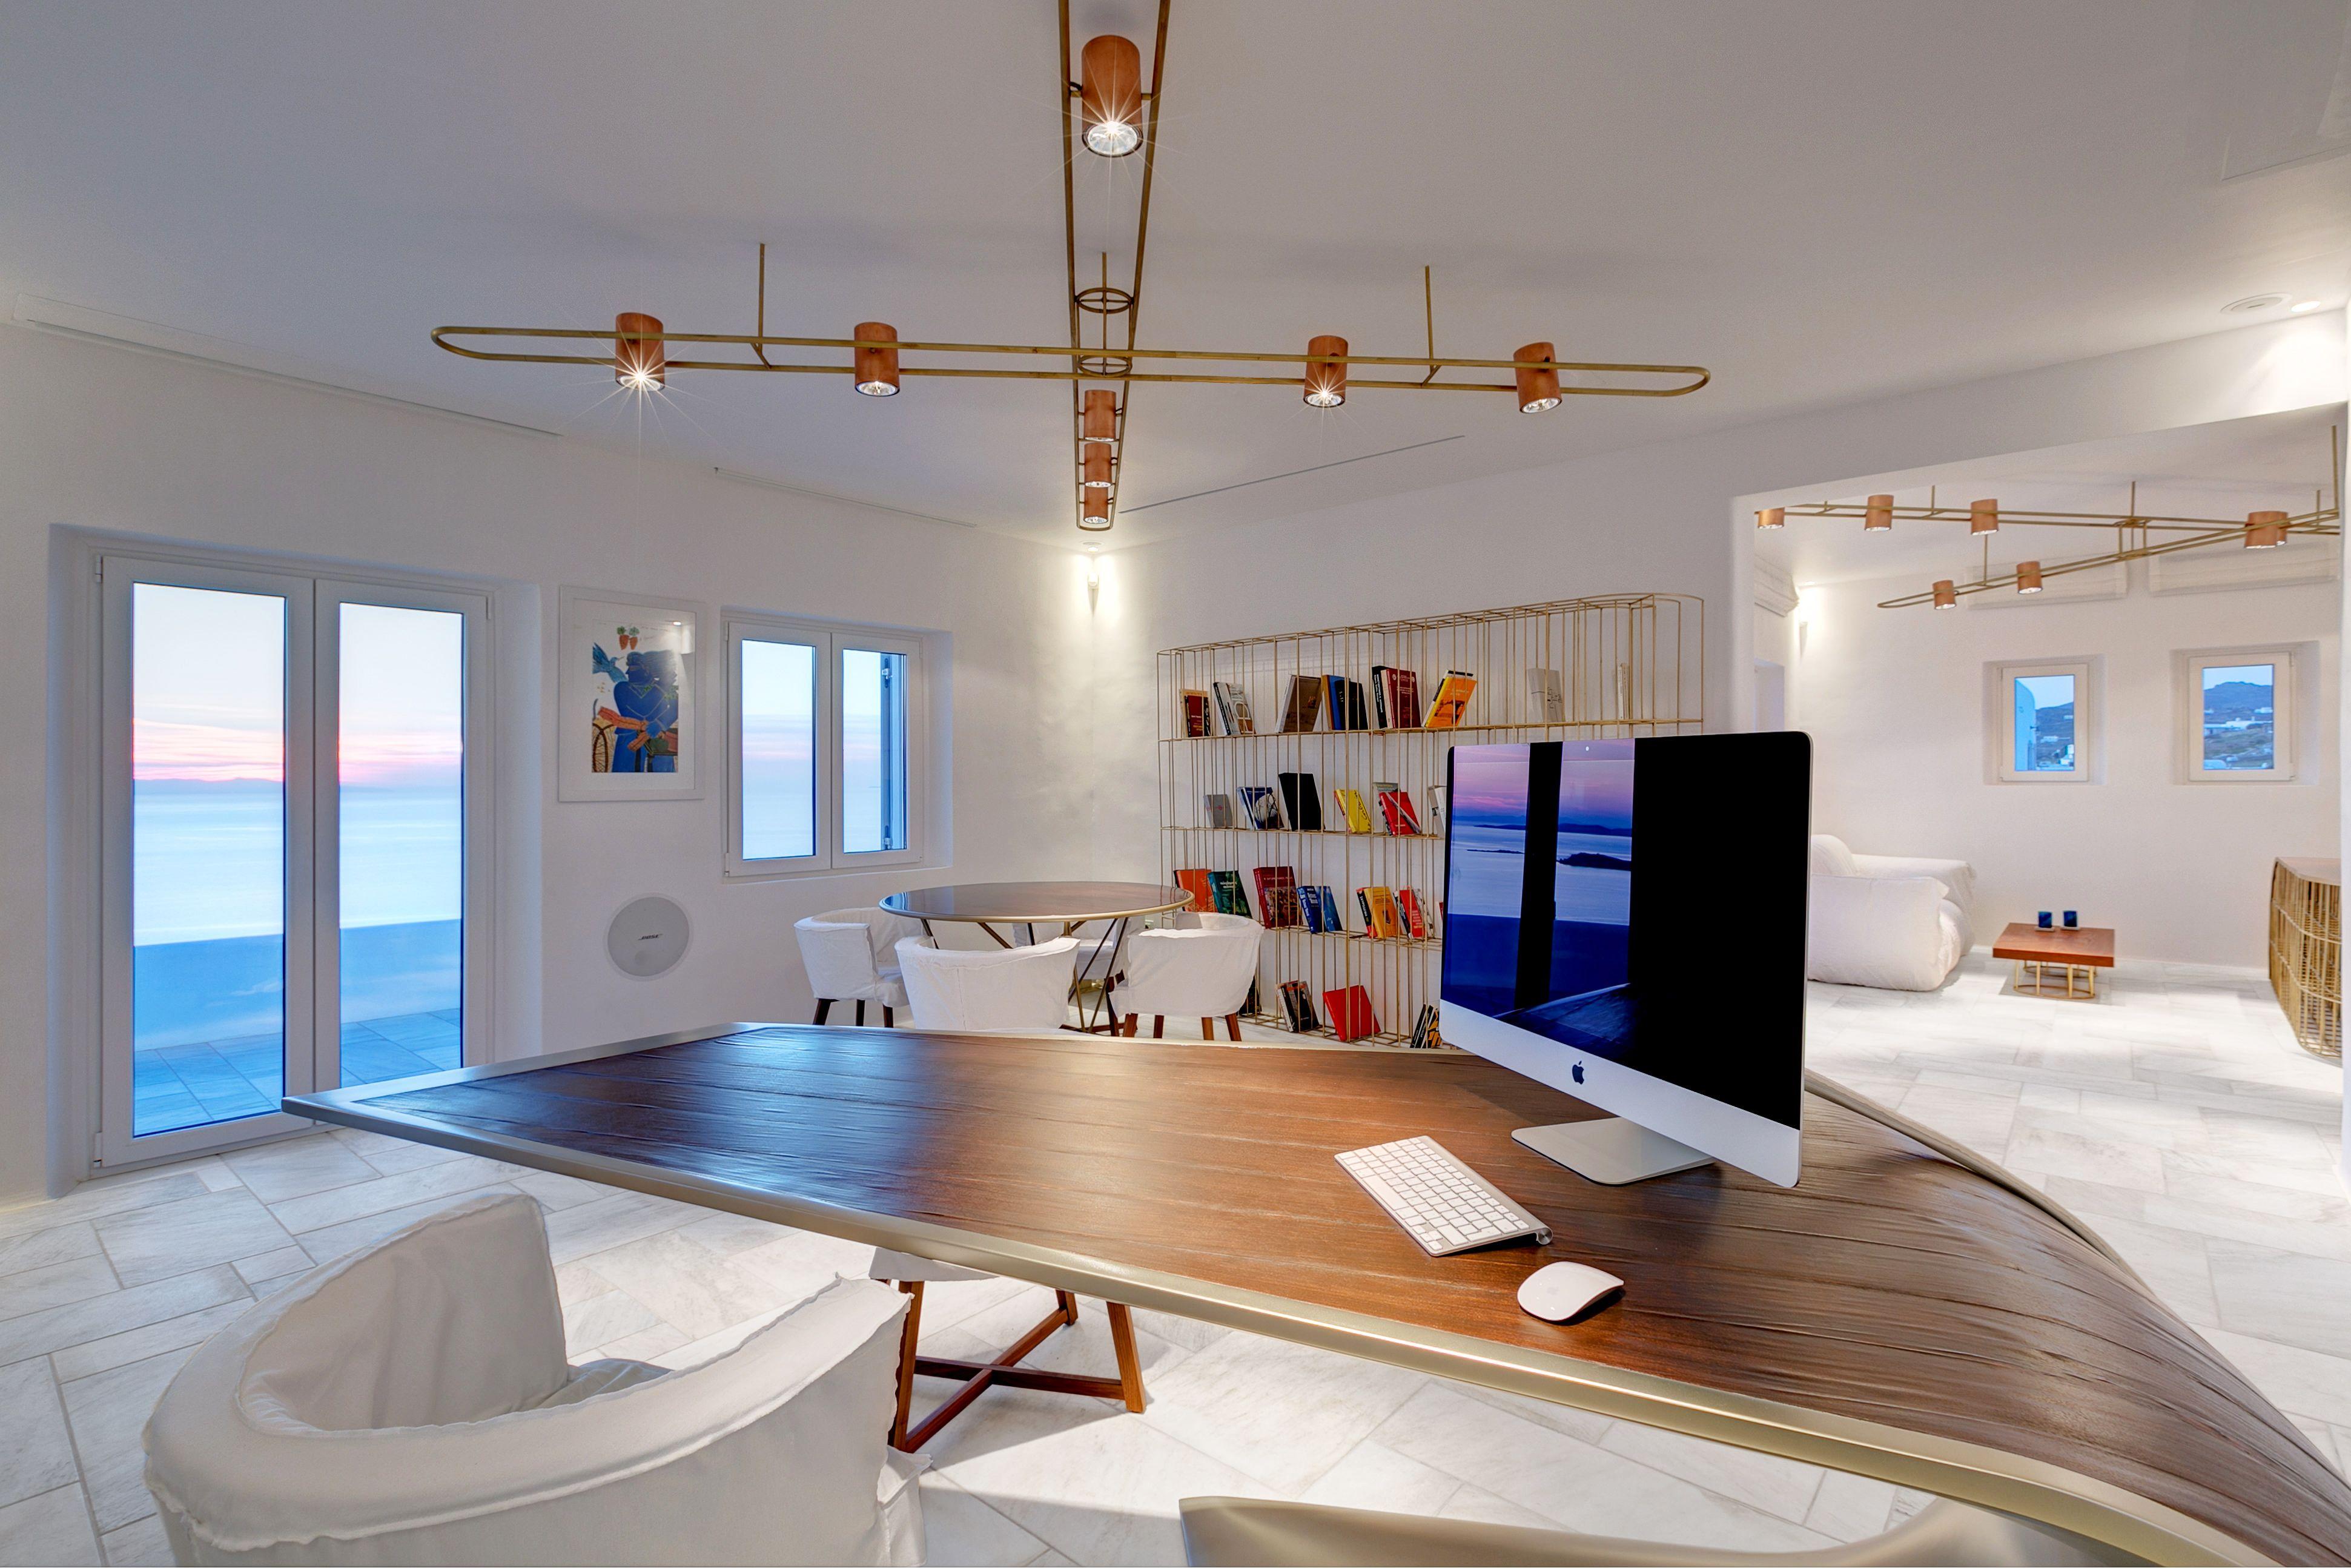 Architecture Mykonos Office Design Eleftherios Ambatzis Structural Engineer Spyridon Apostolou